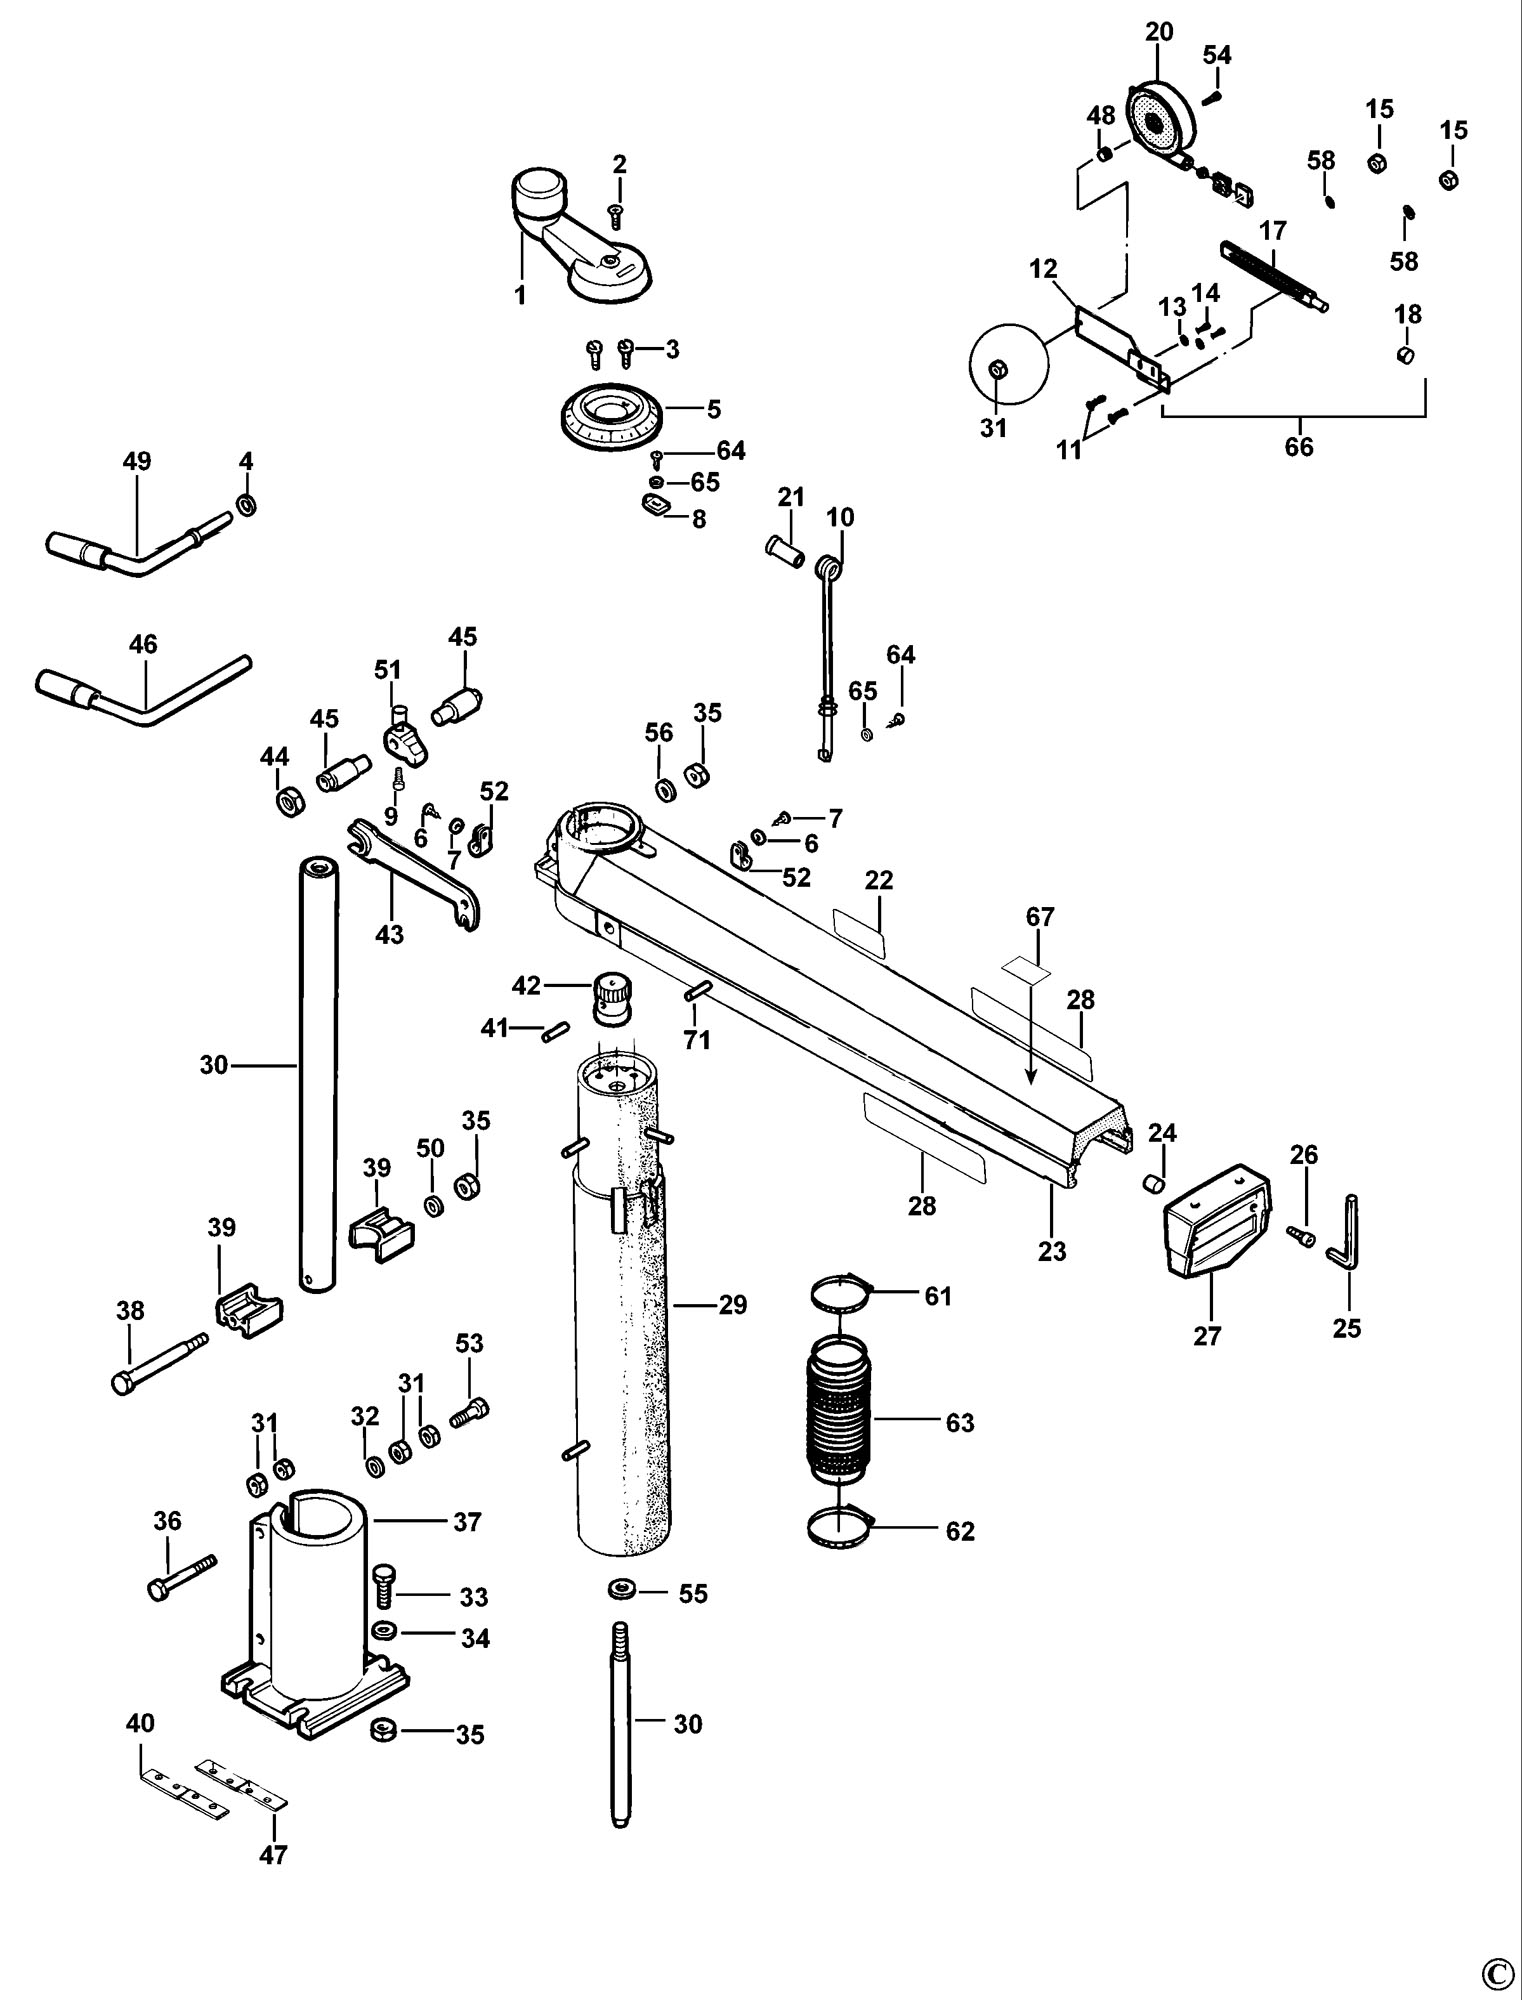 Spares For Dewalt Dw721kn Radial Arm Saw  Type 1  Spare